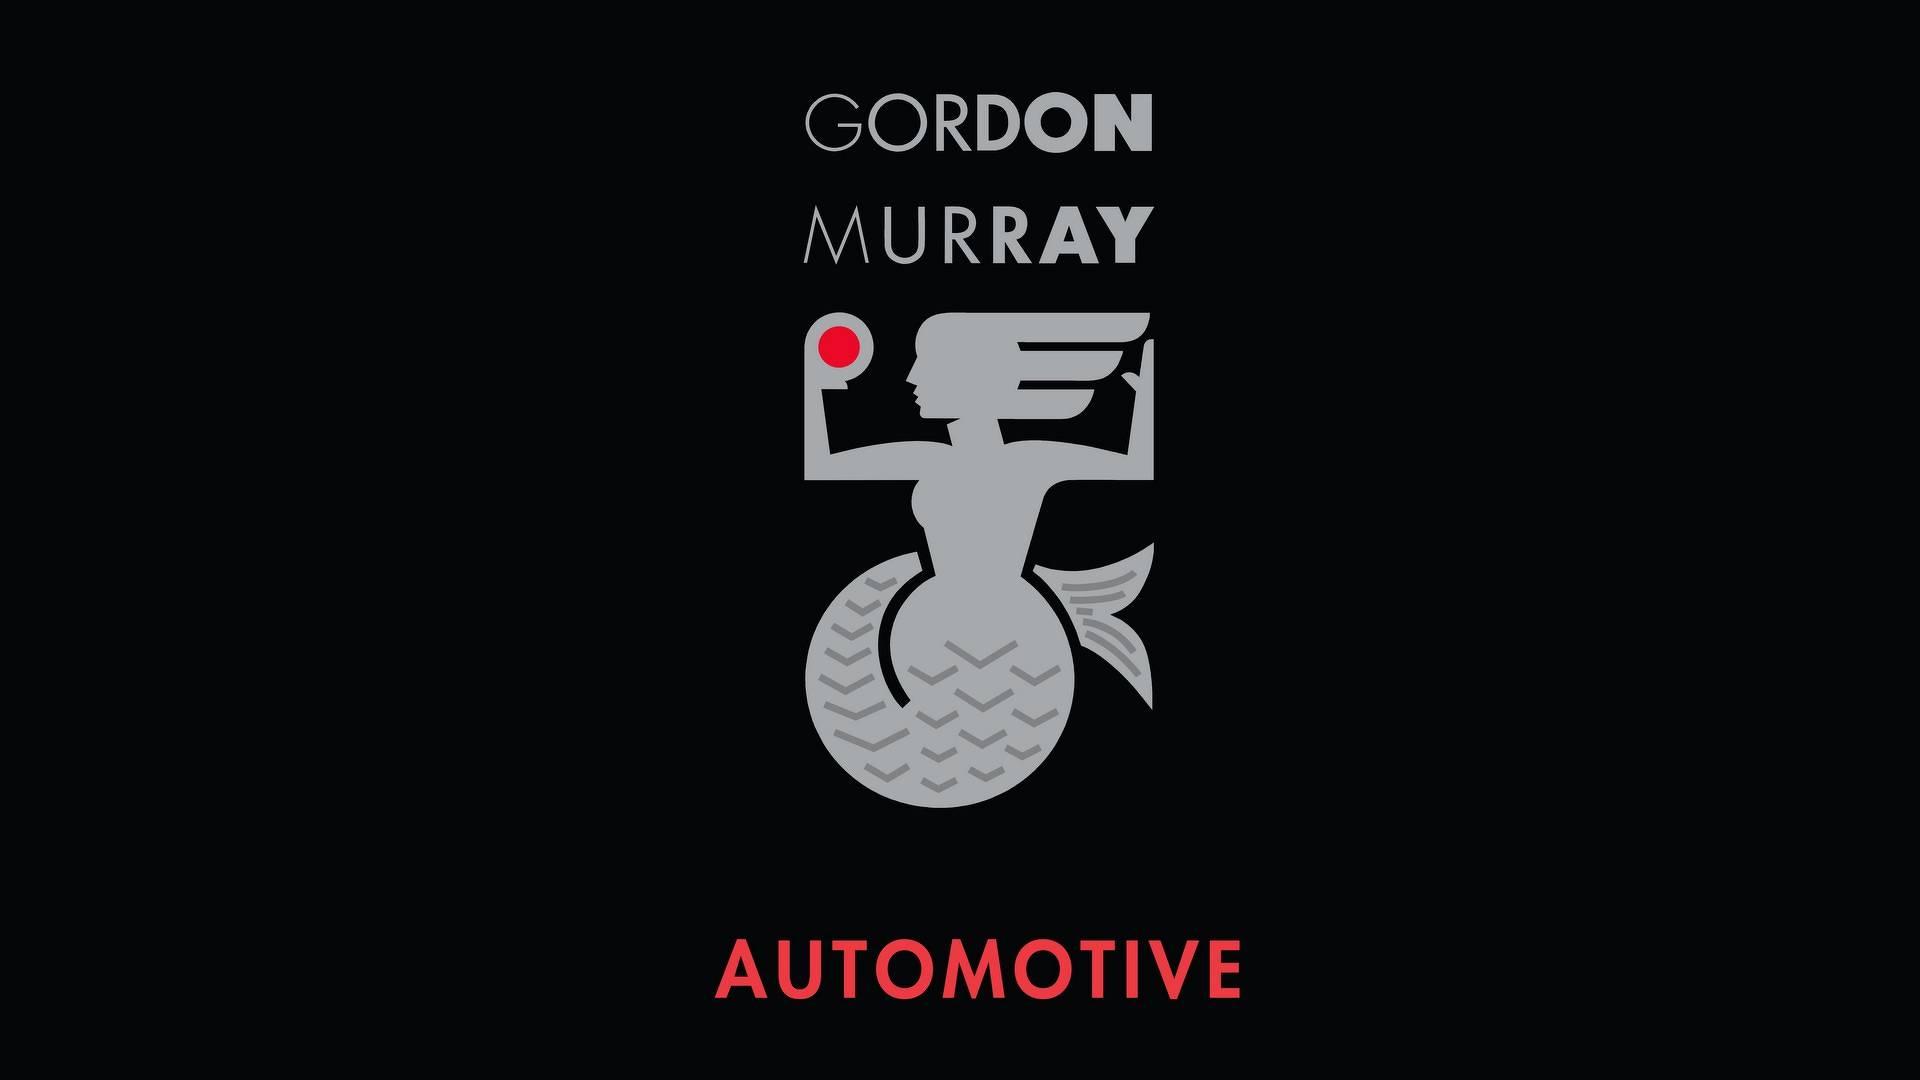 Gordon Murray Automotive To Develop McLaren F1-like Supercar